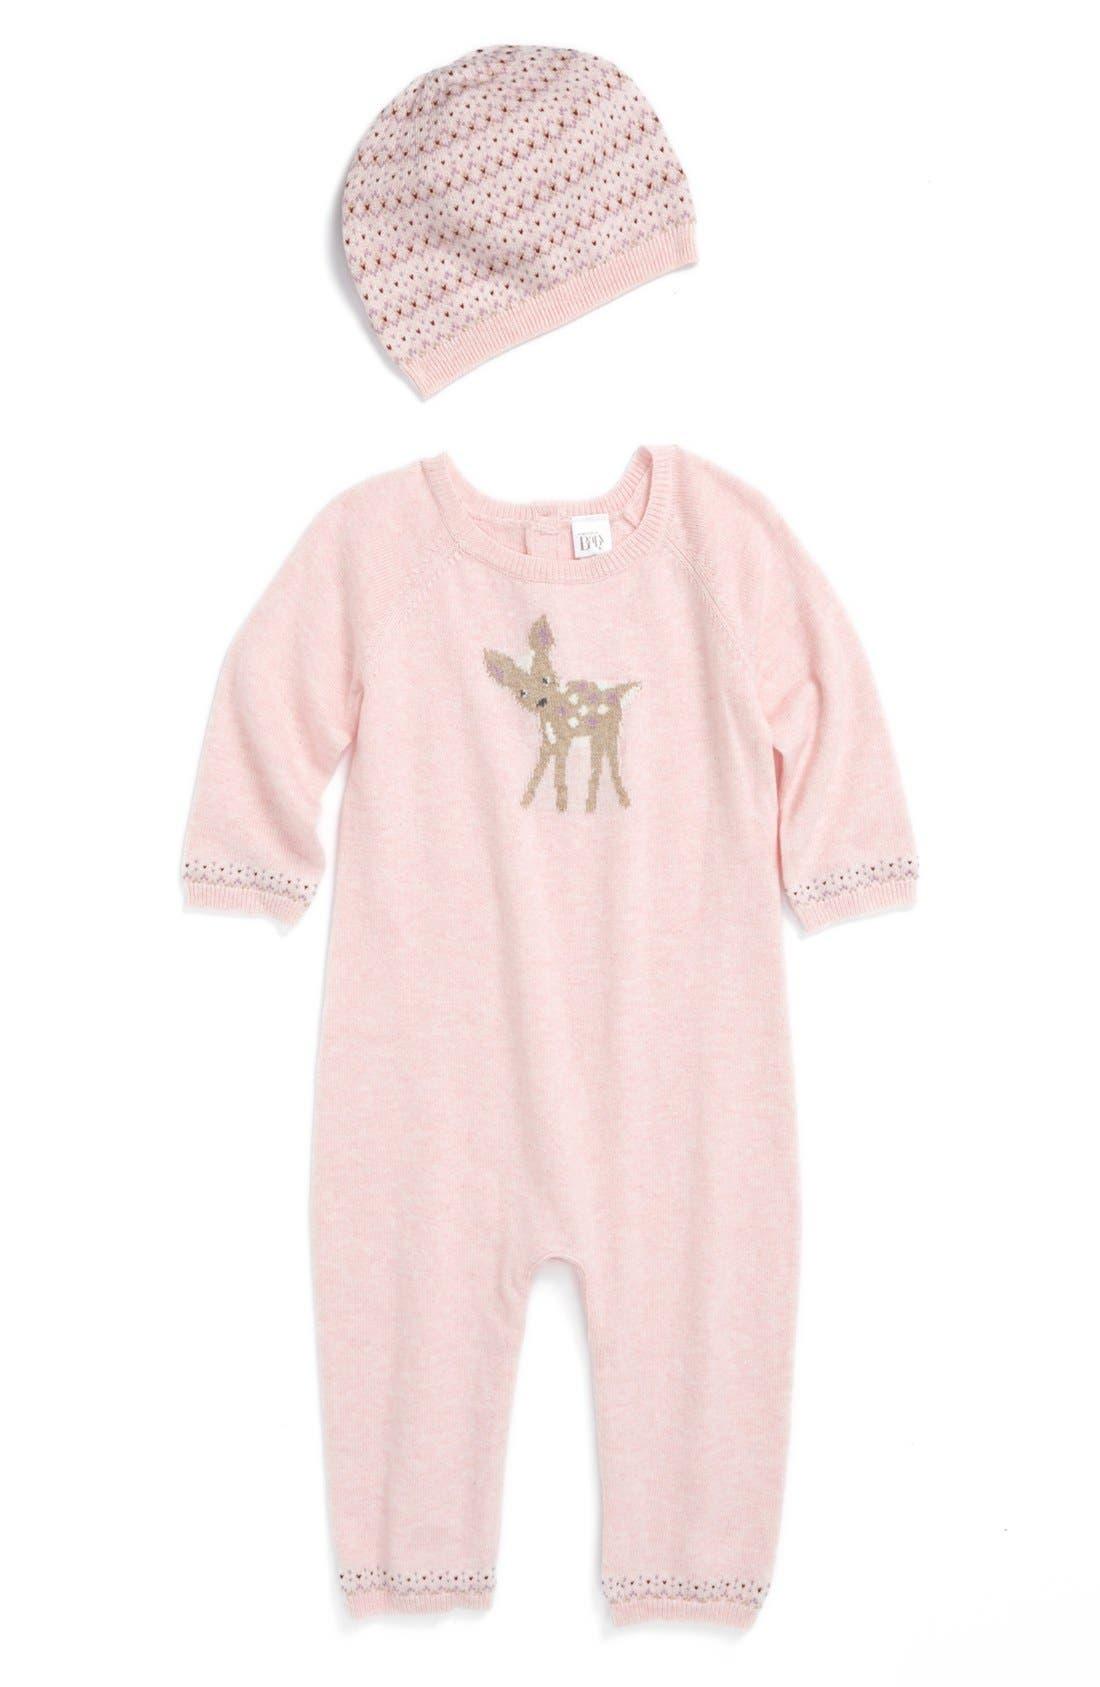 Main Image - Nordstrom Baby Romper & Hat (Baby Girls)